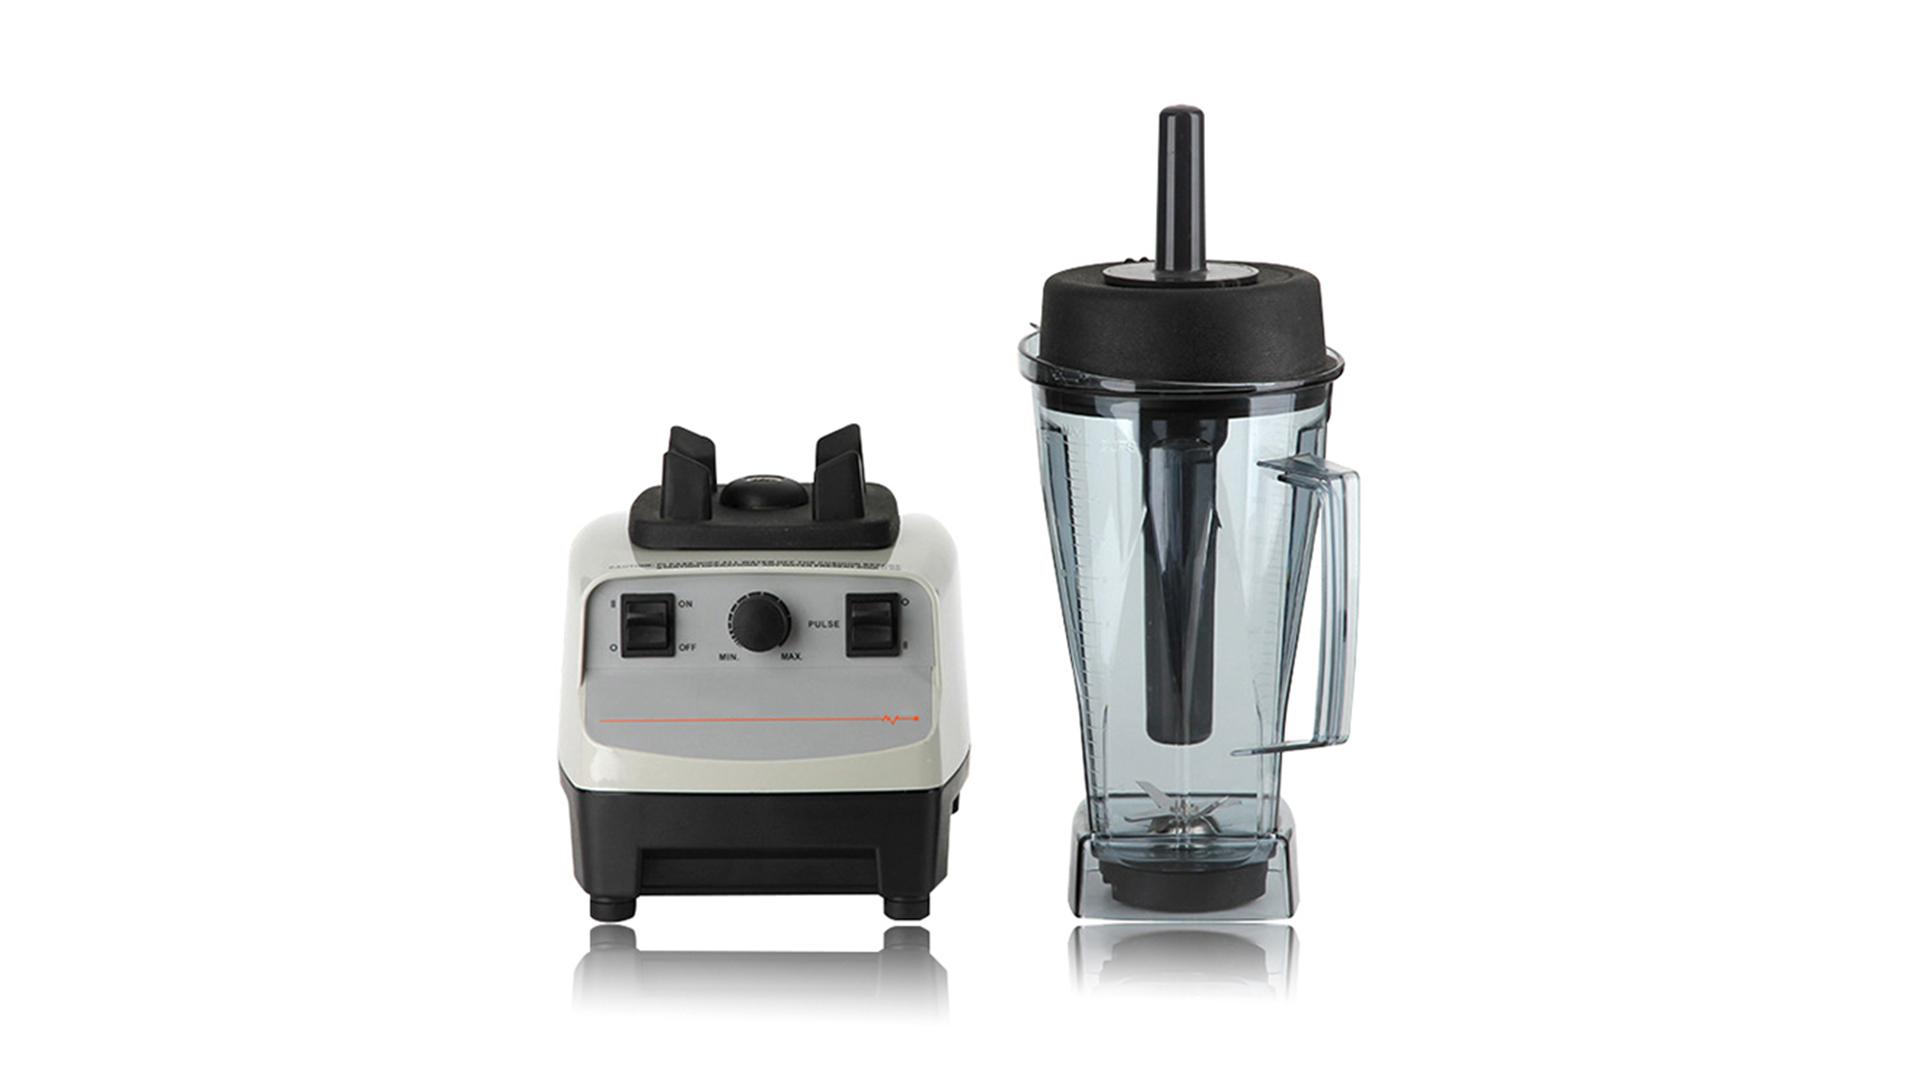 Wholesale 2L Multifunctional Fruit Juice Ice Maker, Ice Shaver Blender for Drinks withgoodprice-Benchu